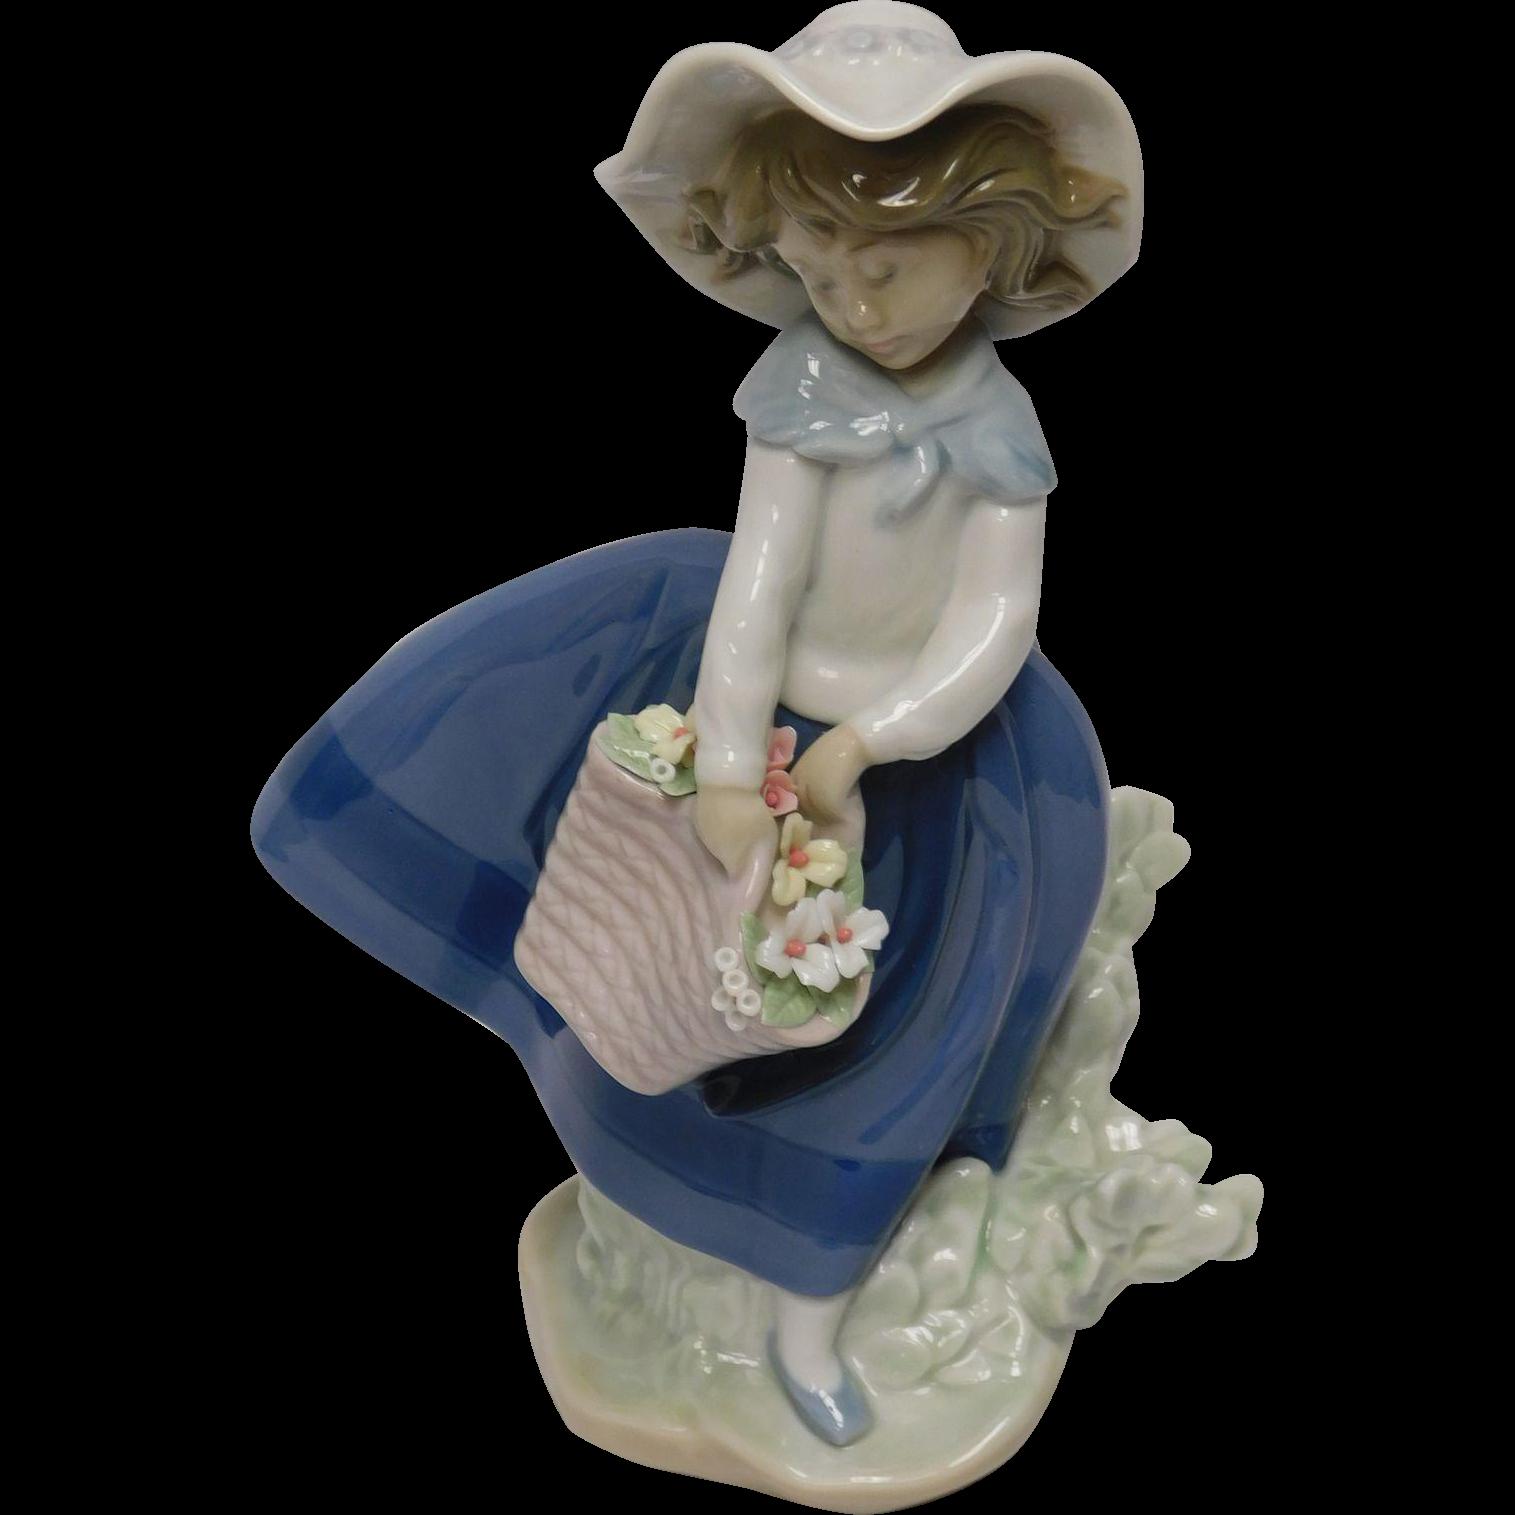 Lladro Porcelain Figurine: Pretty Pickings